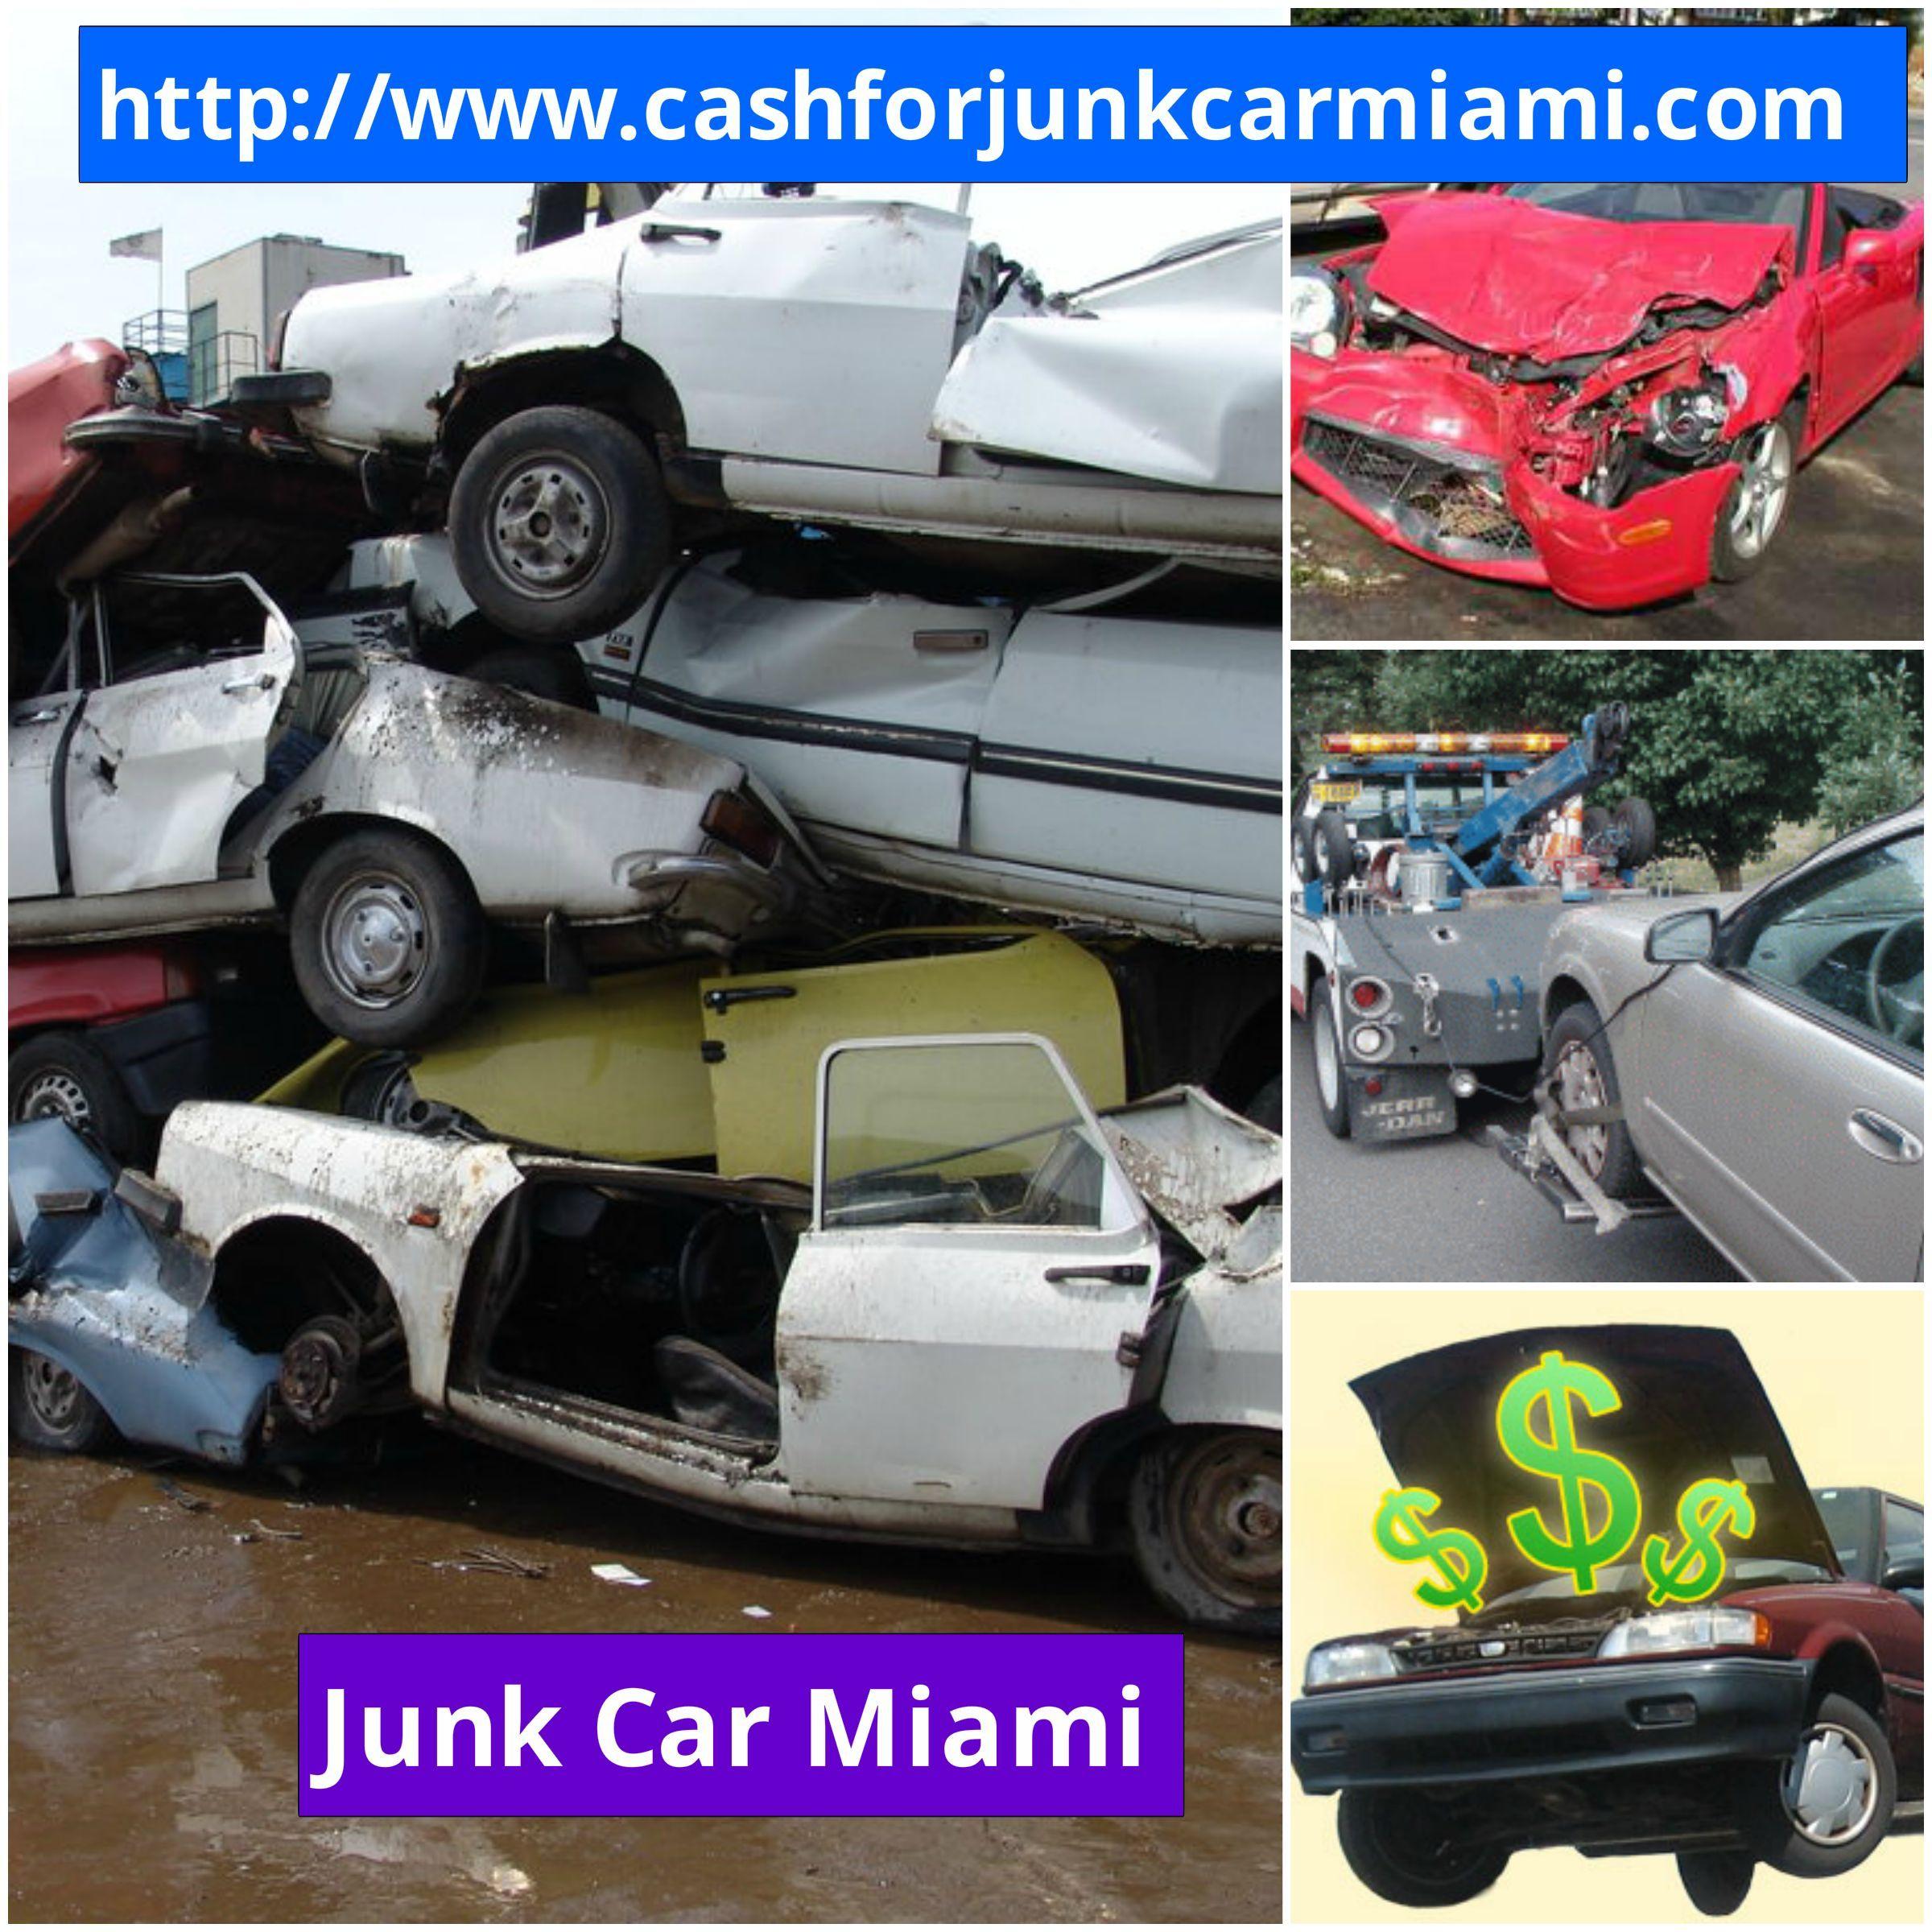 http://www.cashforjunkcarmiami.com Junk Car Miami provides fast and ...